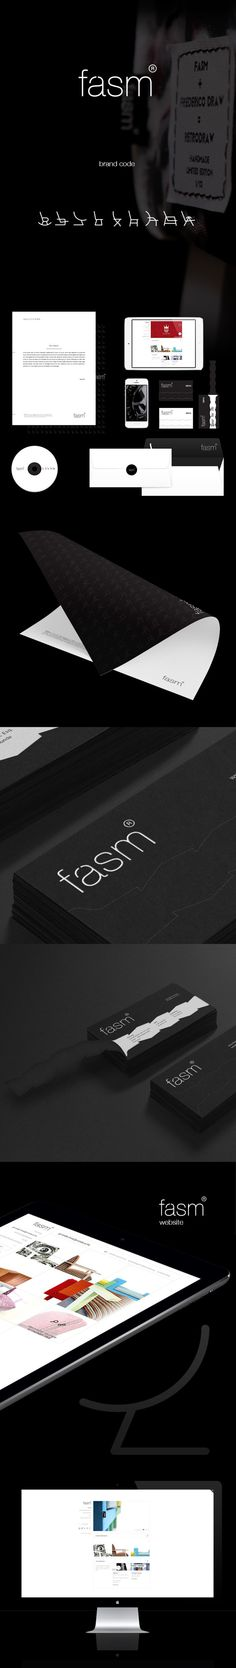 fasm brand identity on Behance